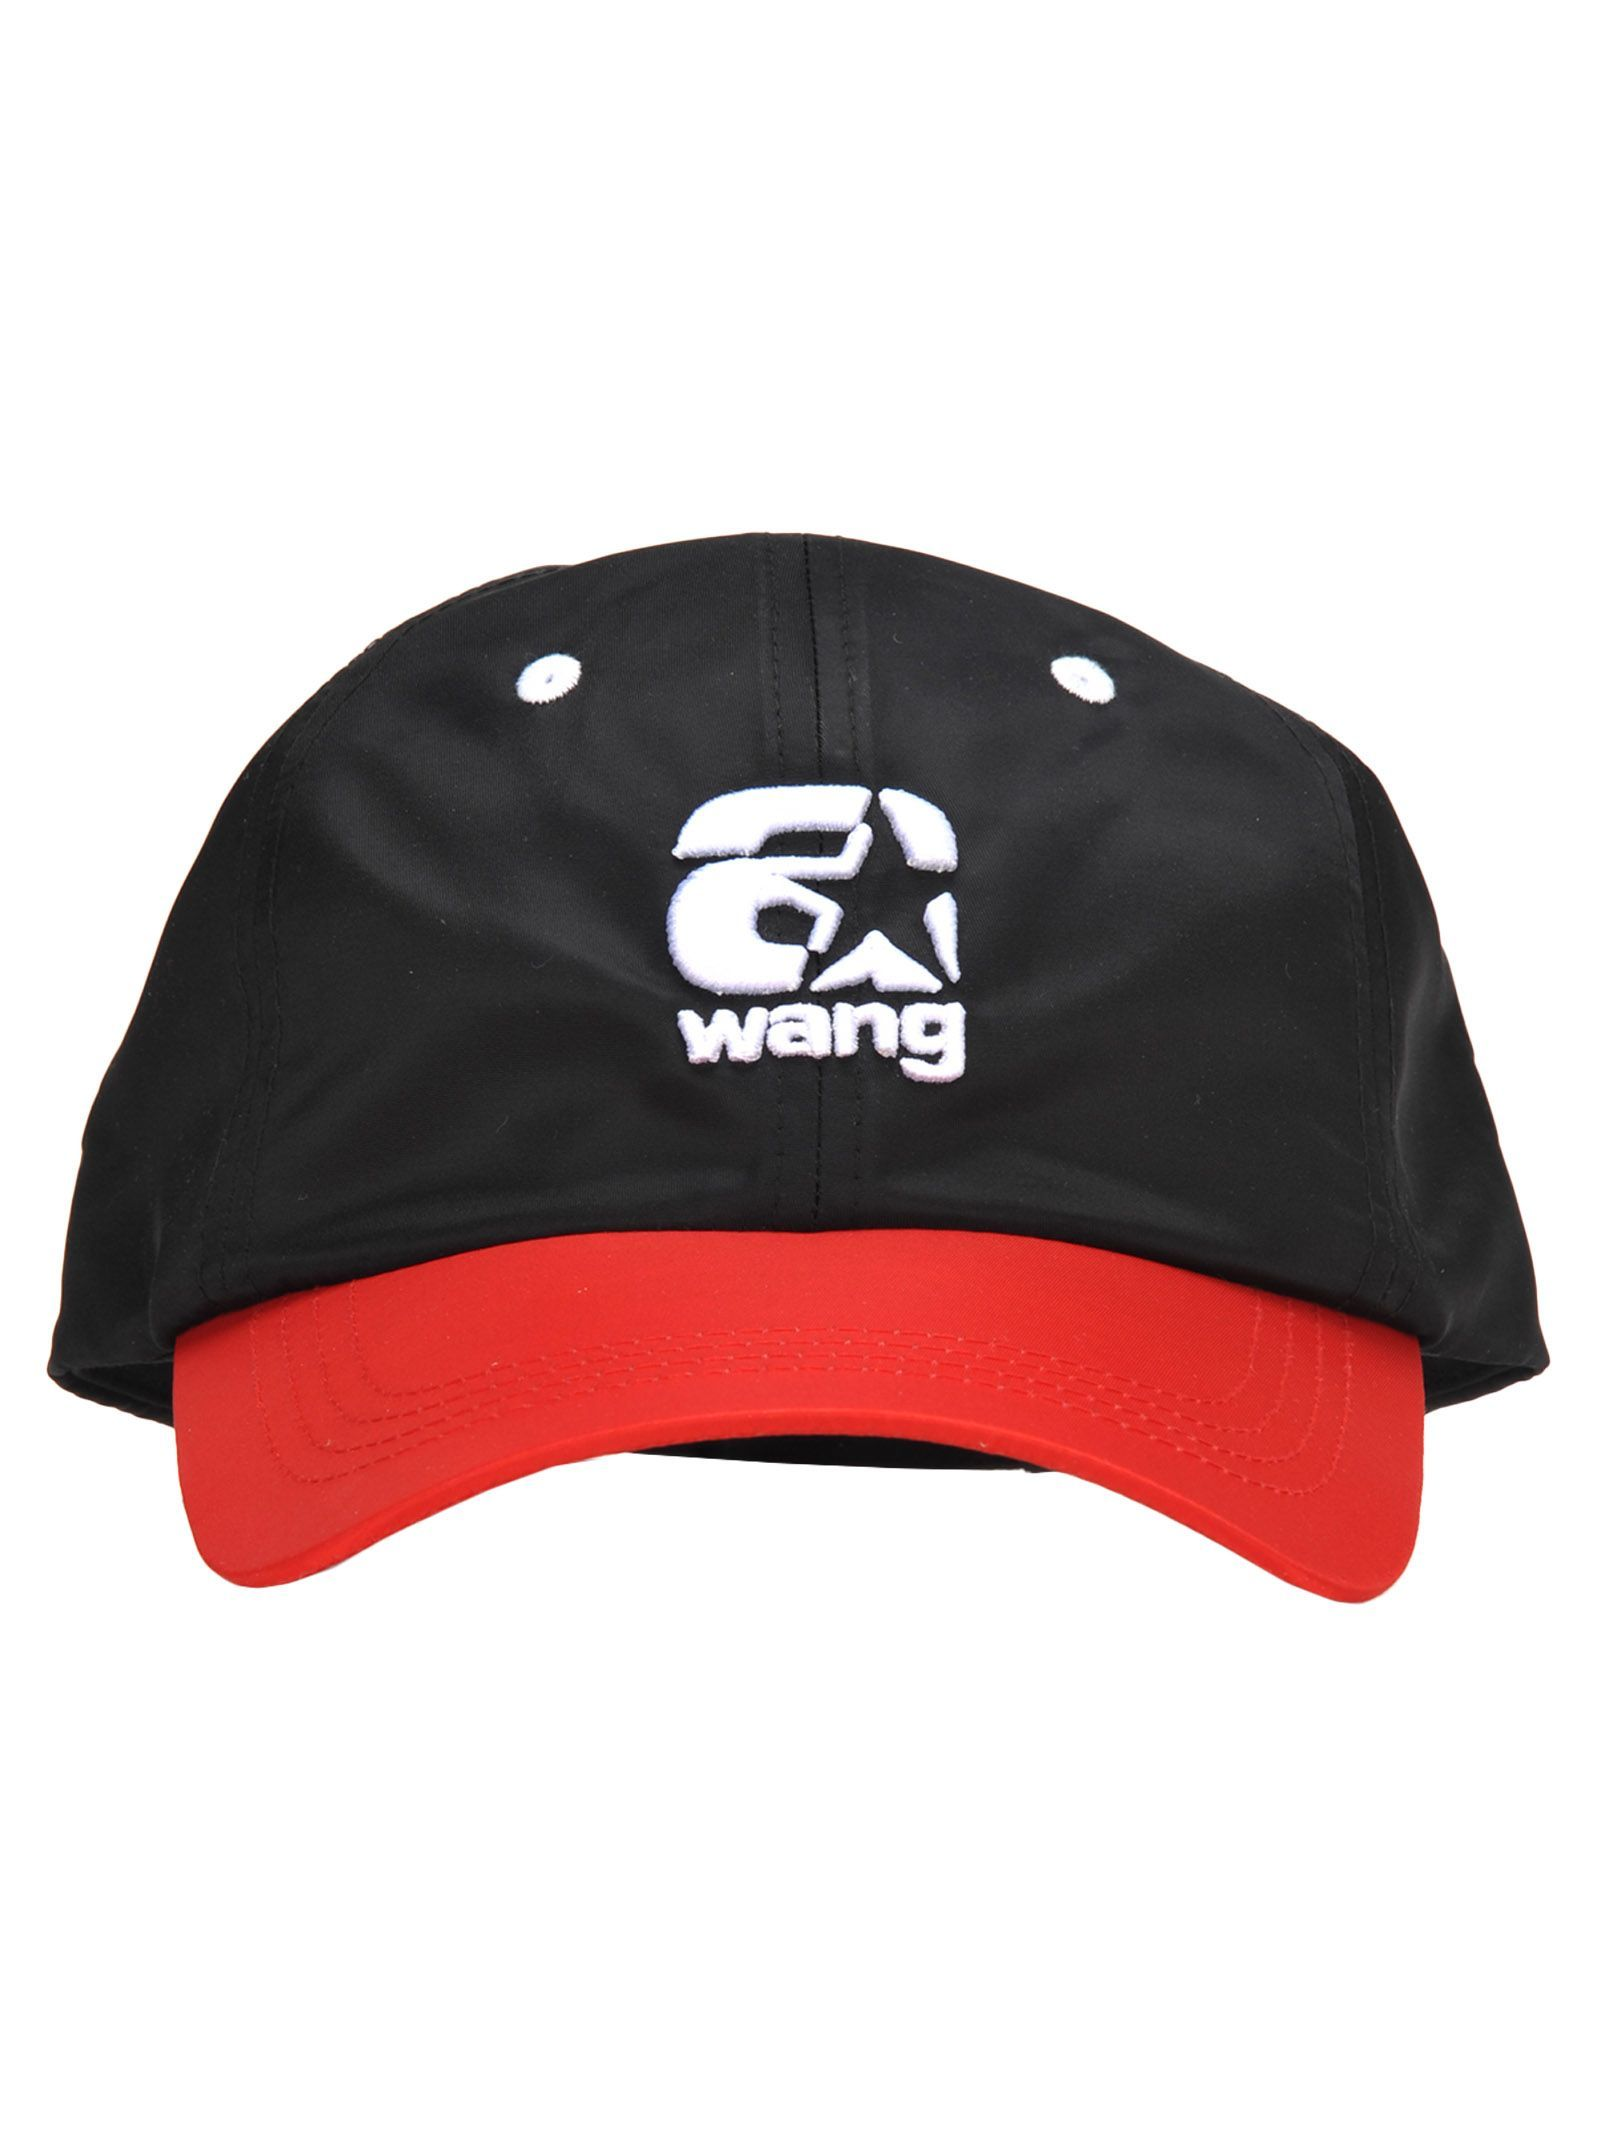 63ad668be3a ALEXANDER WANG BASEBALL CAP.  alexanderwang